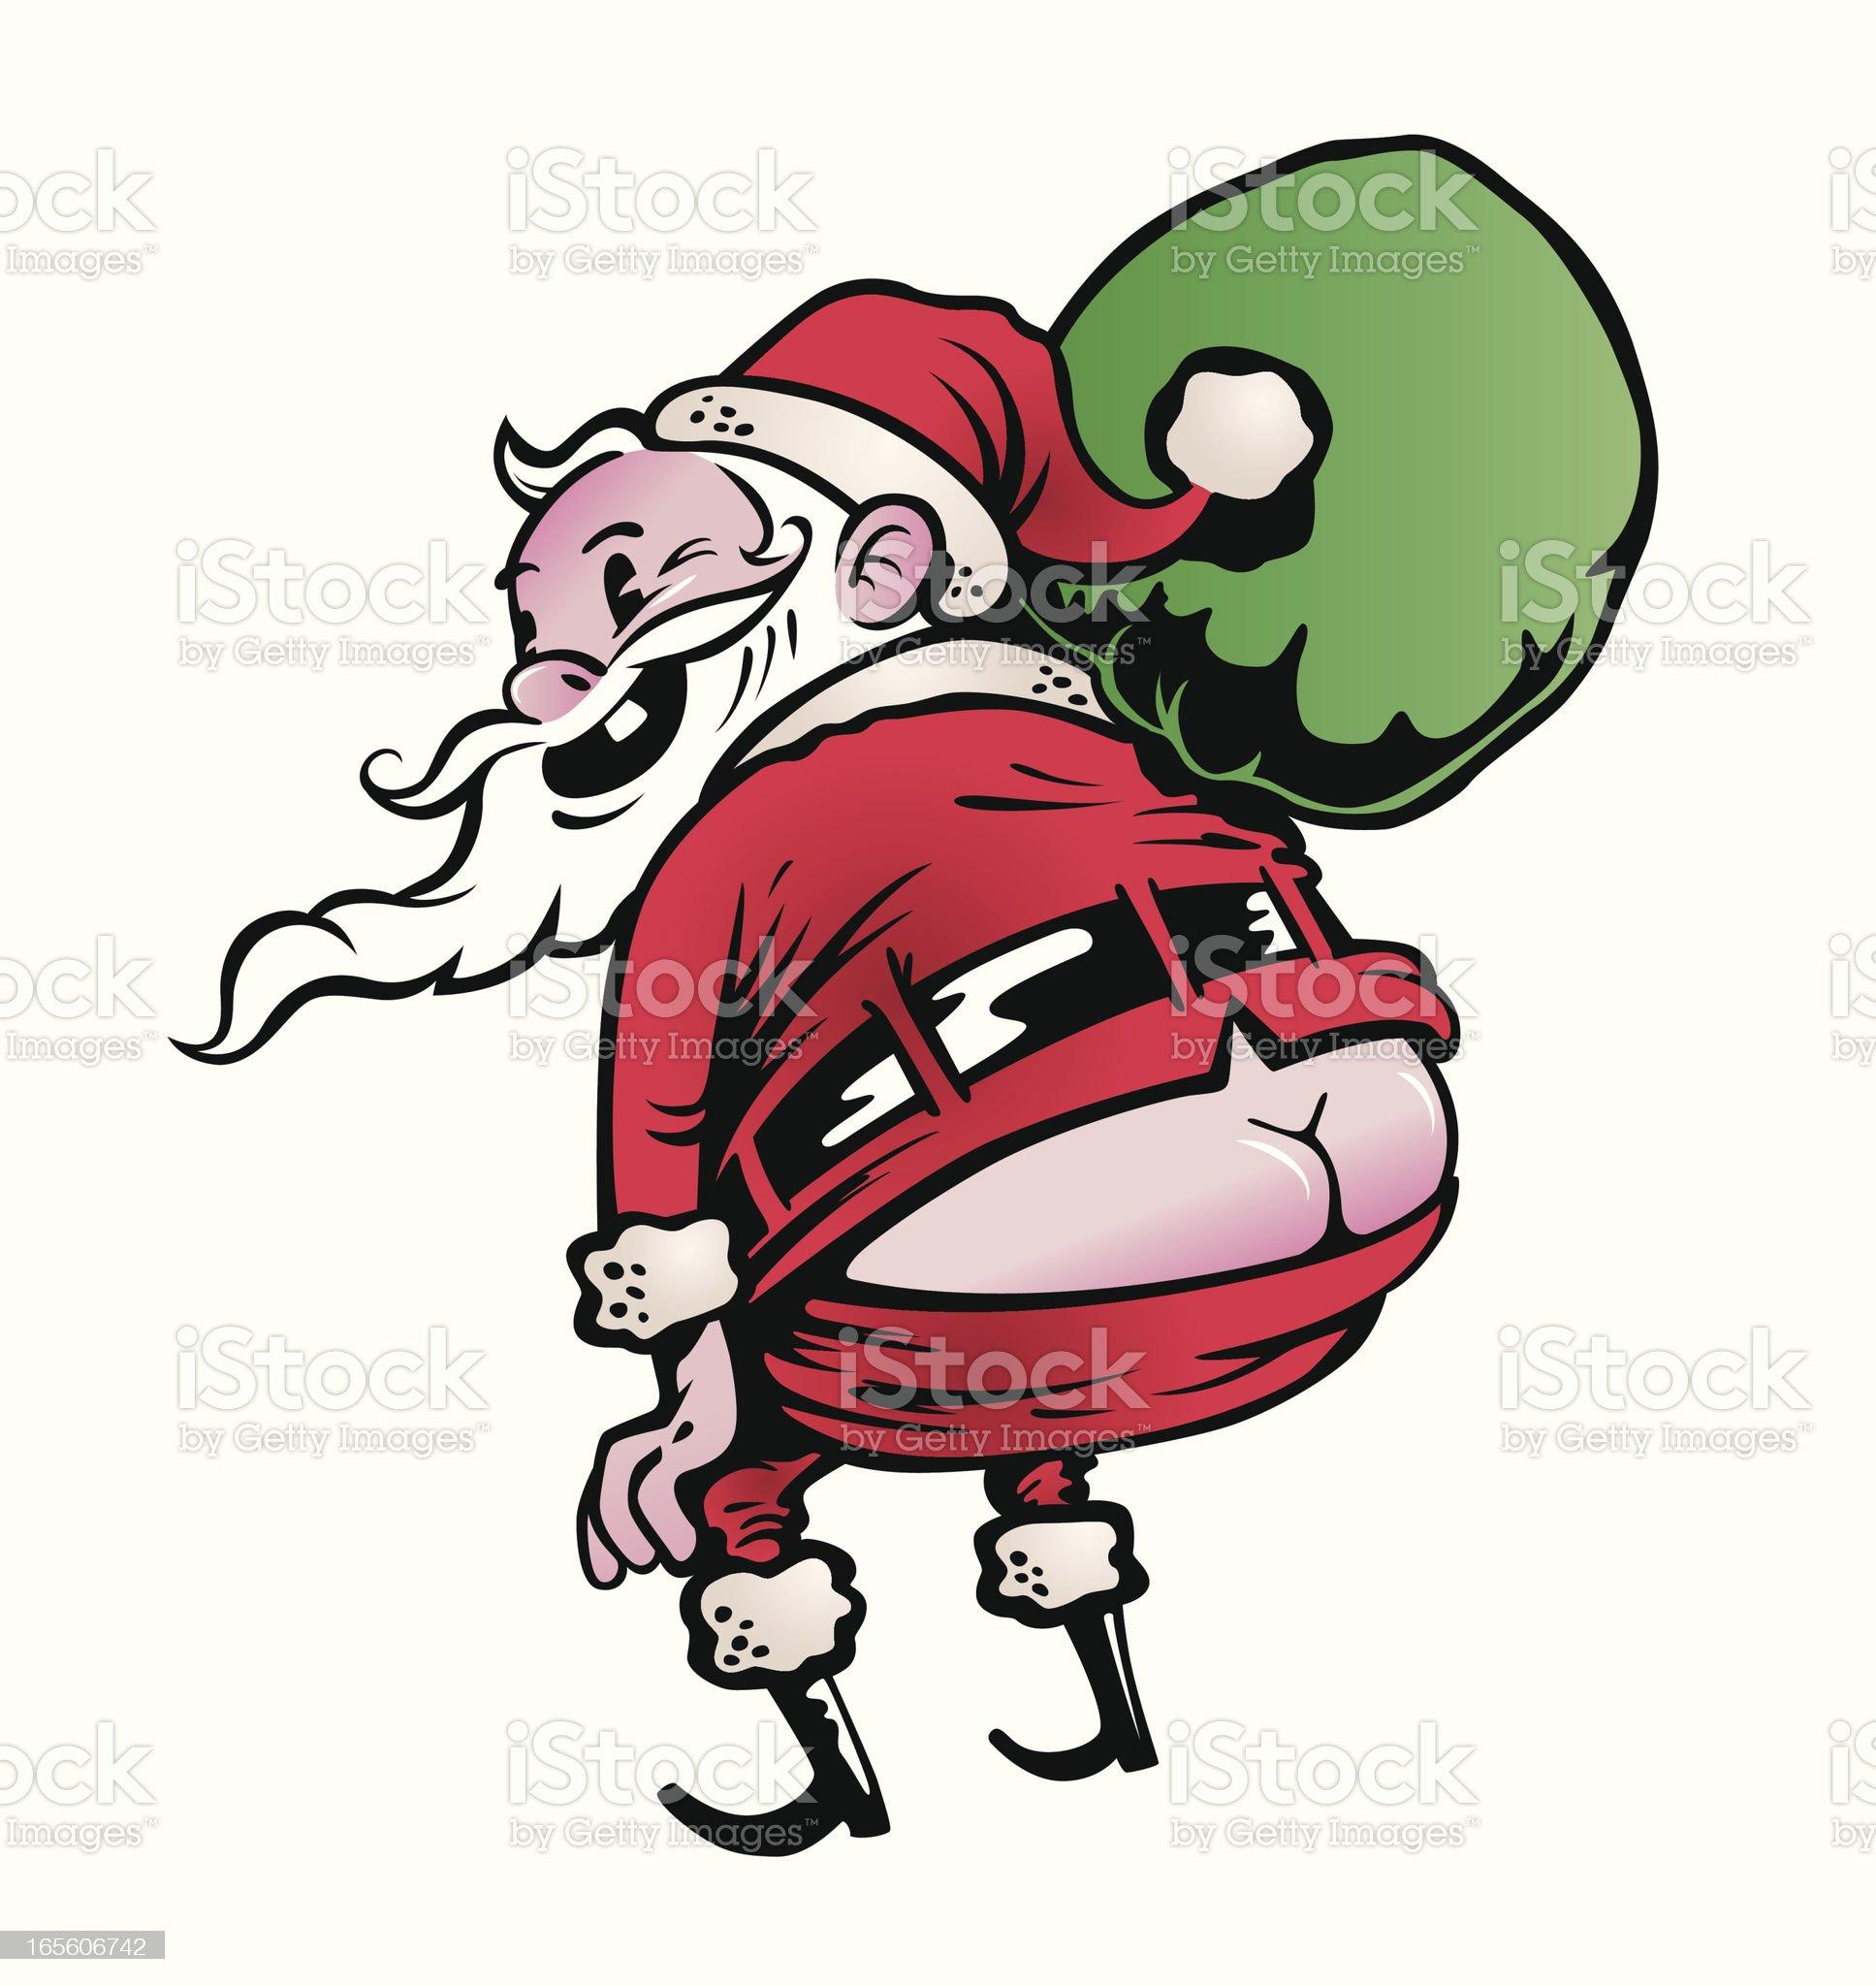 Moonlighting Santa royalty-free stock vector art